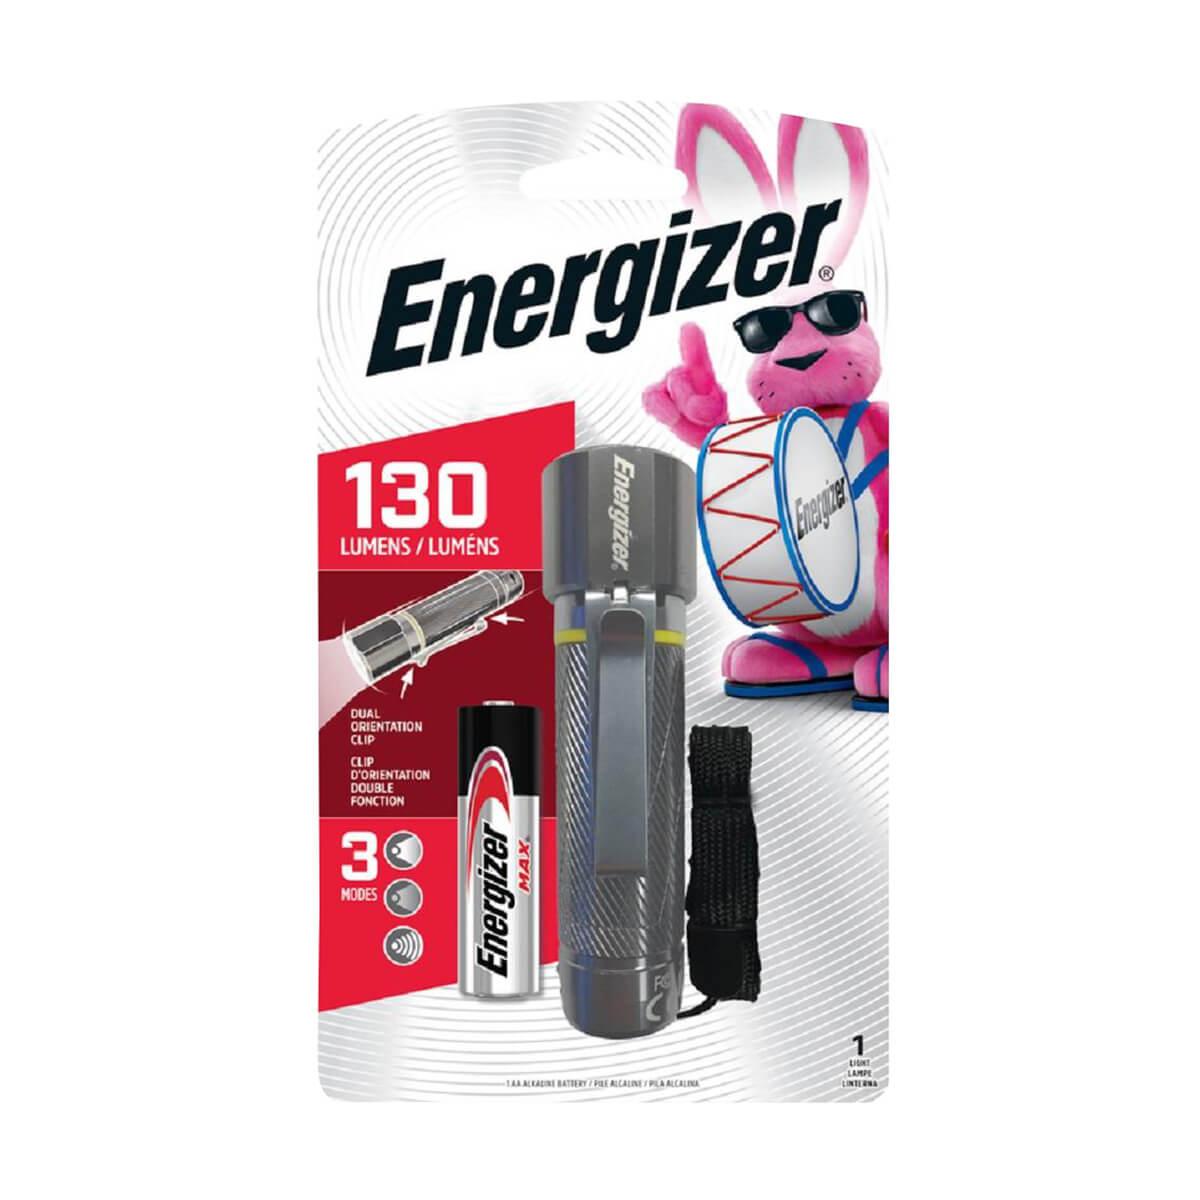 Flashlight - Energizer - Small - 130 lu